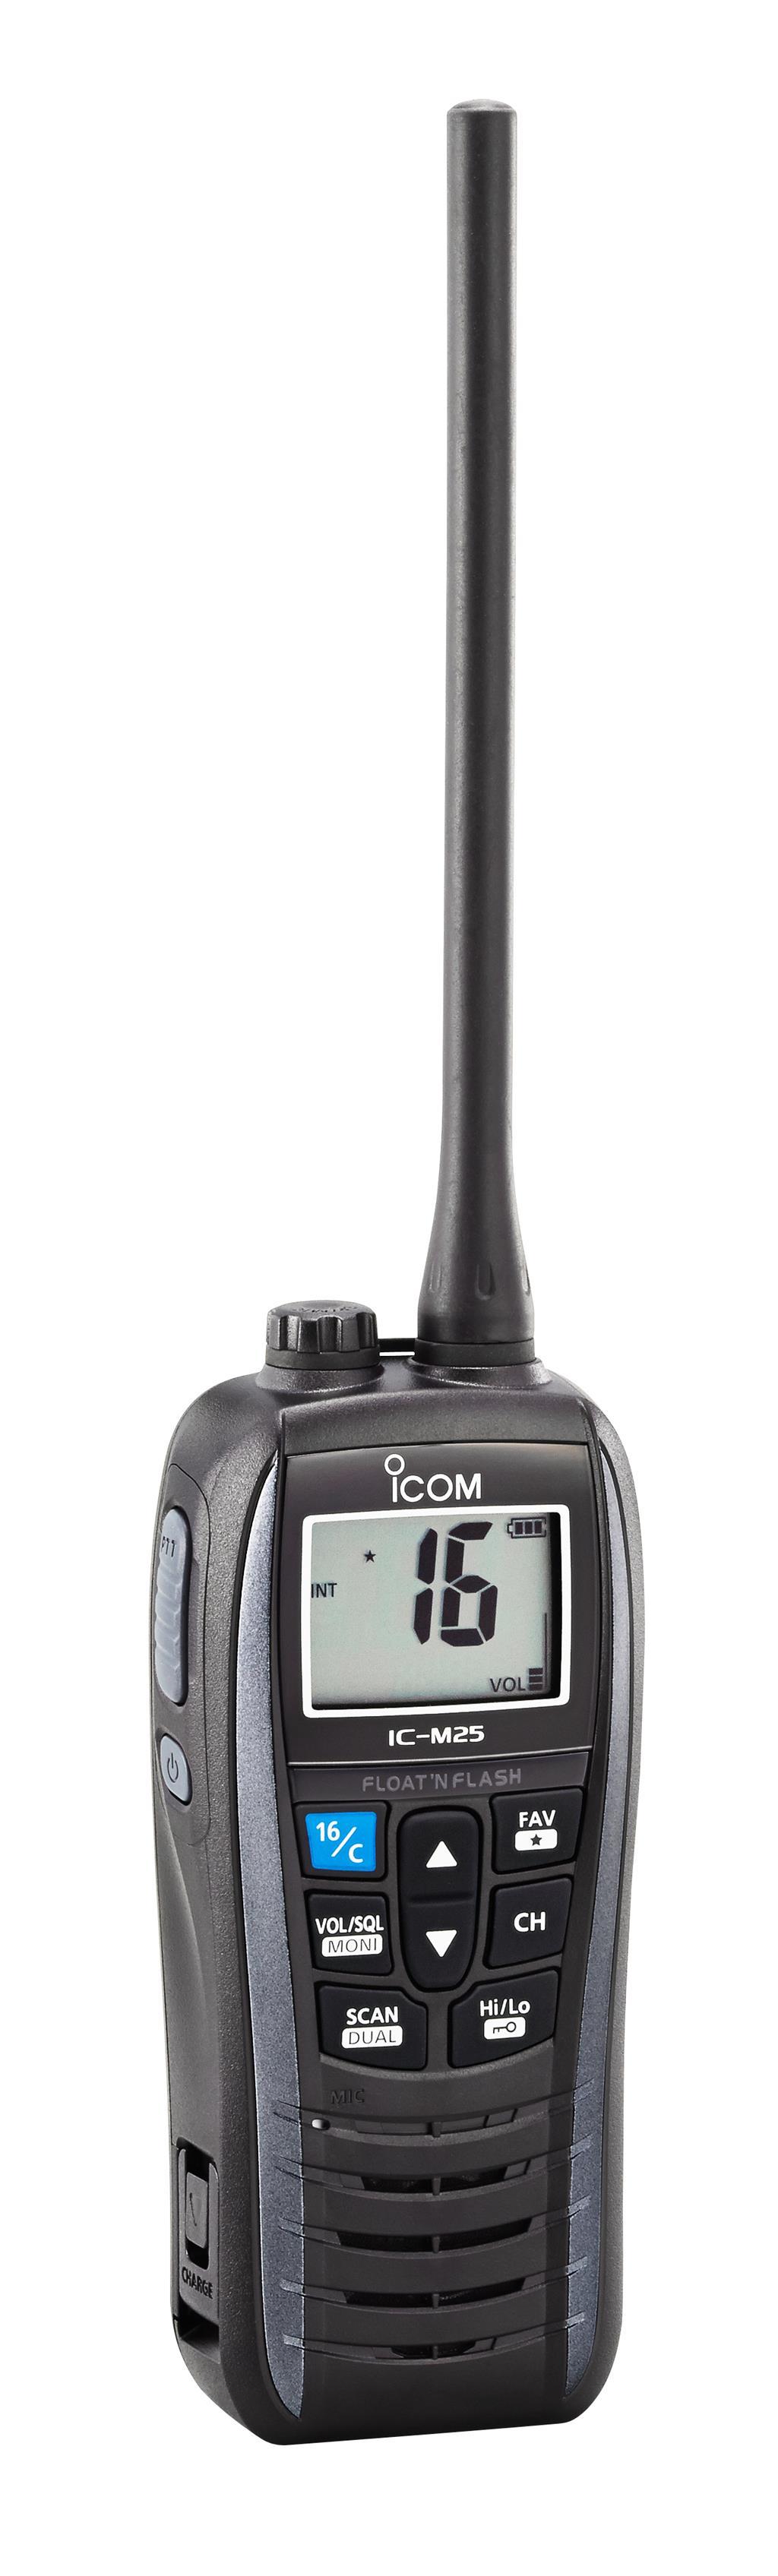 The all new Icom M25 hand held VHF Radio - Image 6